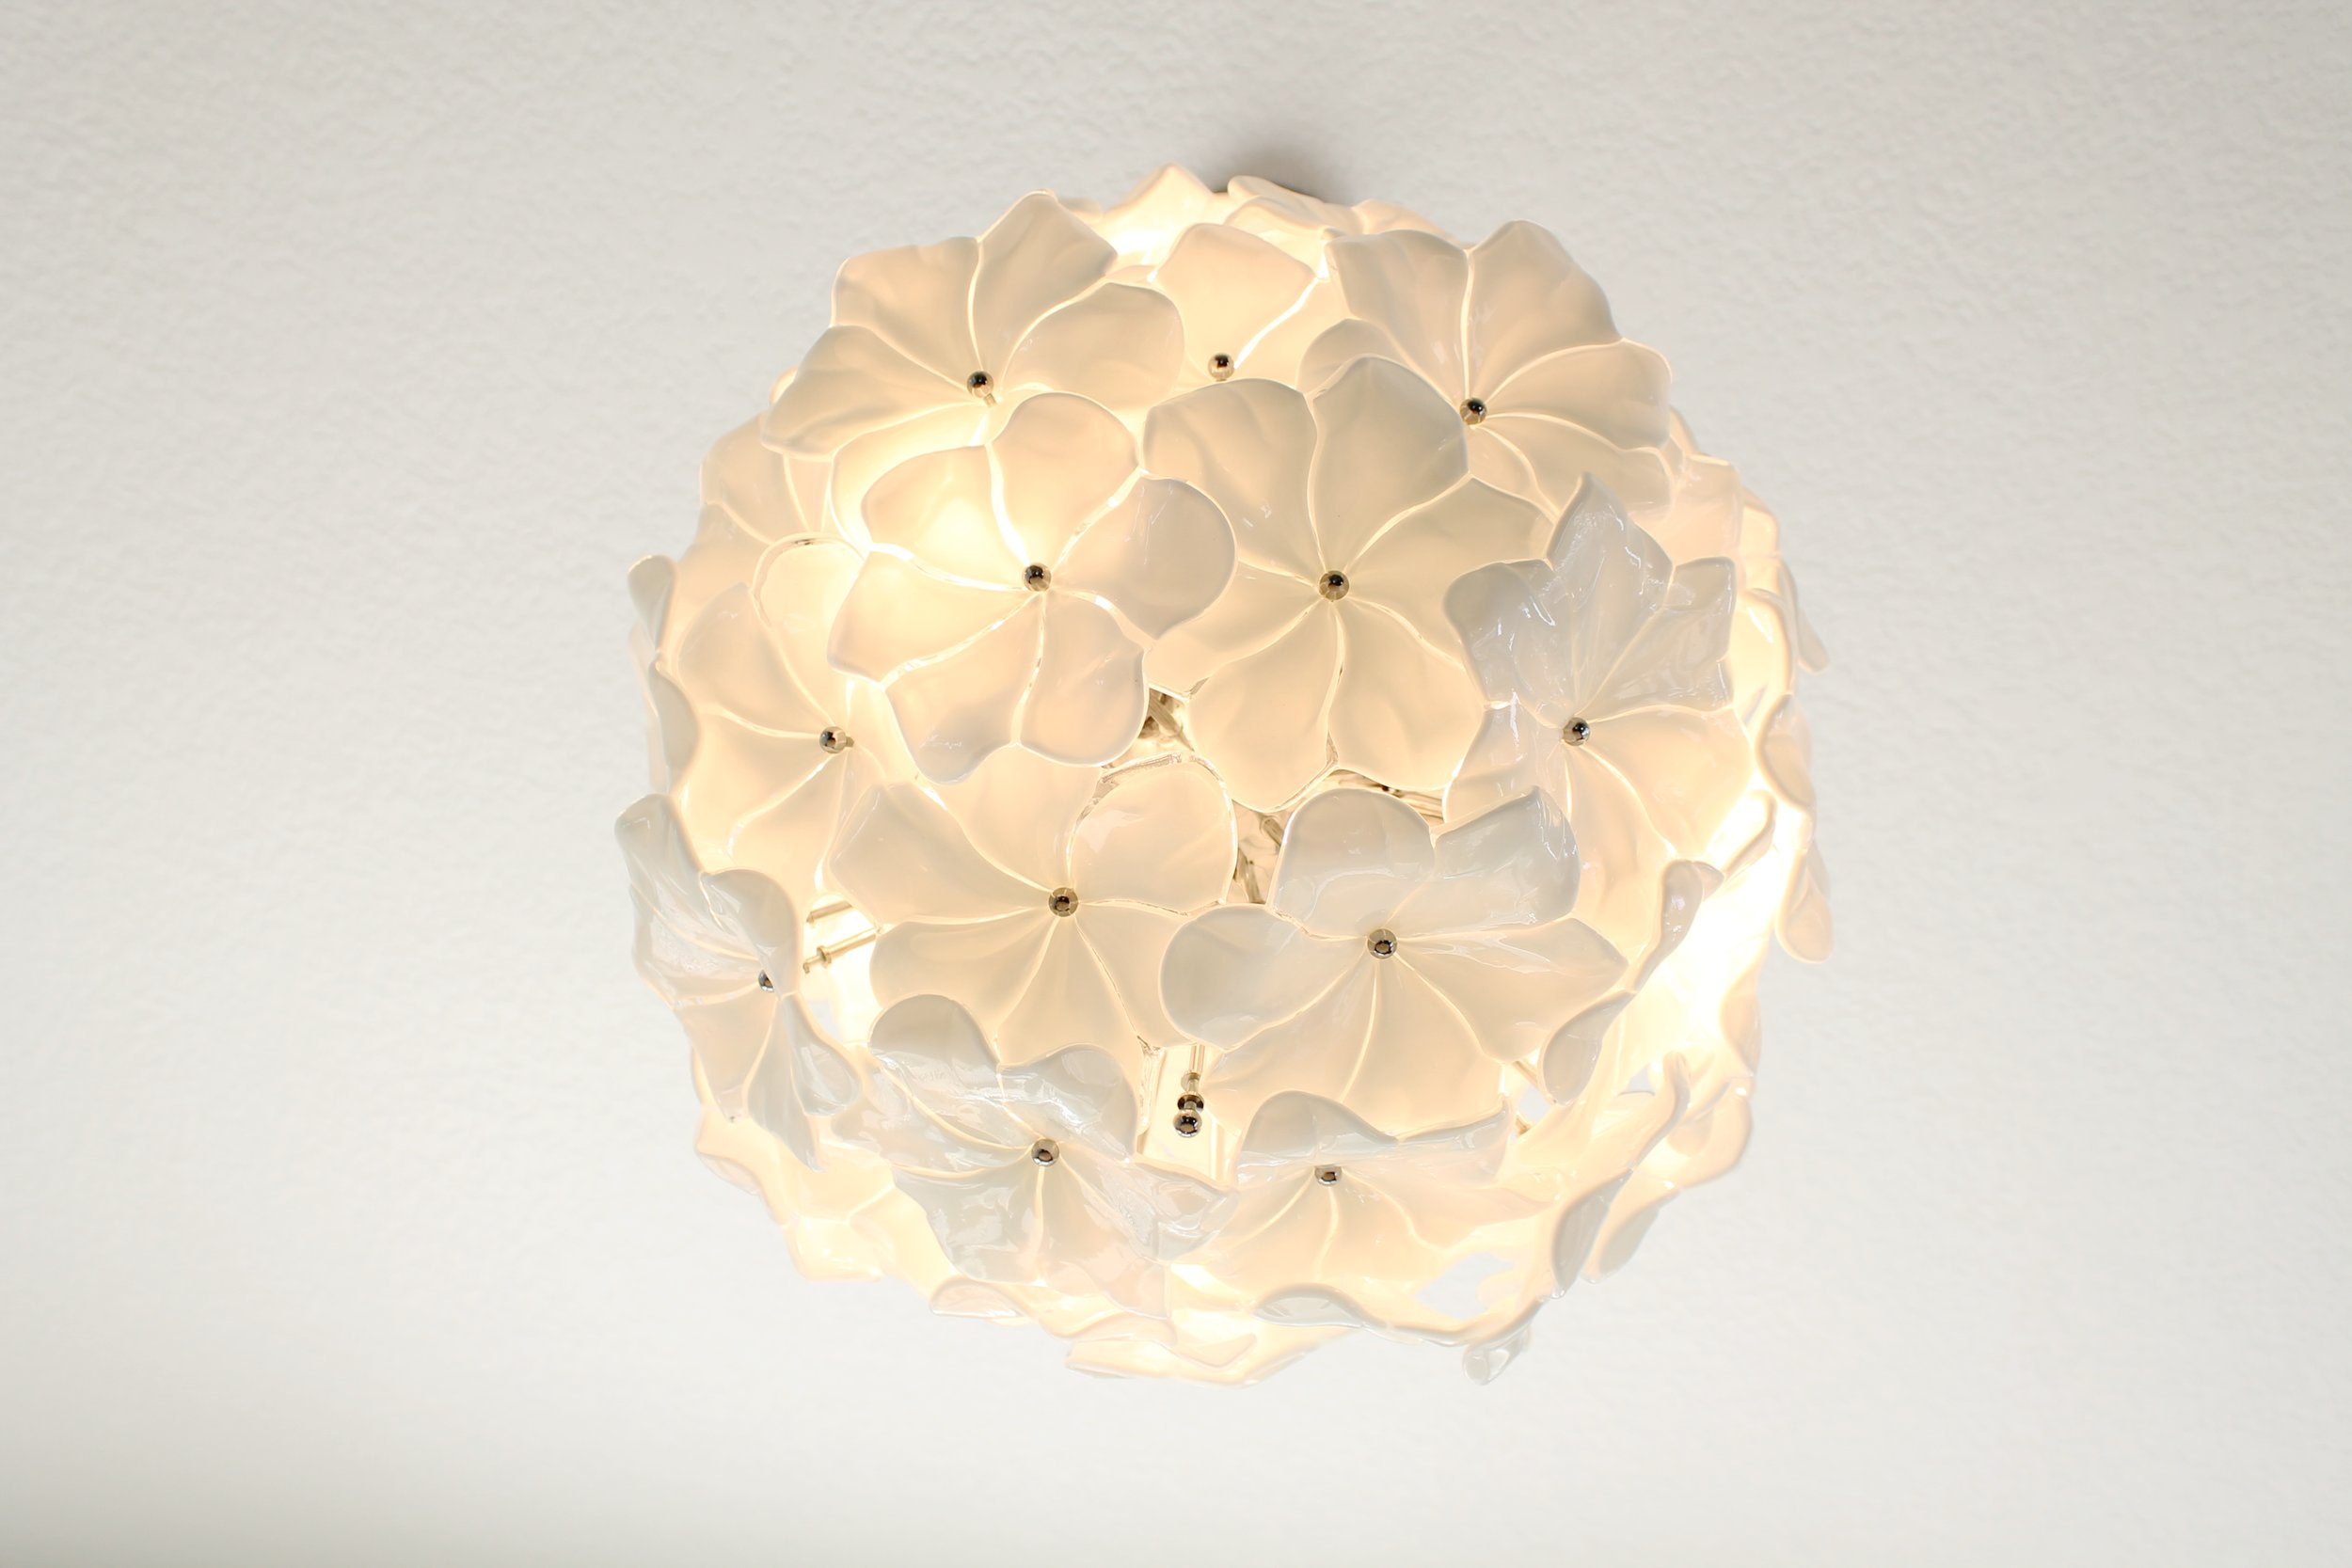 Murano hand made glass flower chandelier. White flower chandelier made in Italy.